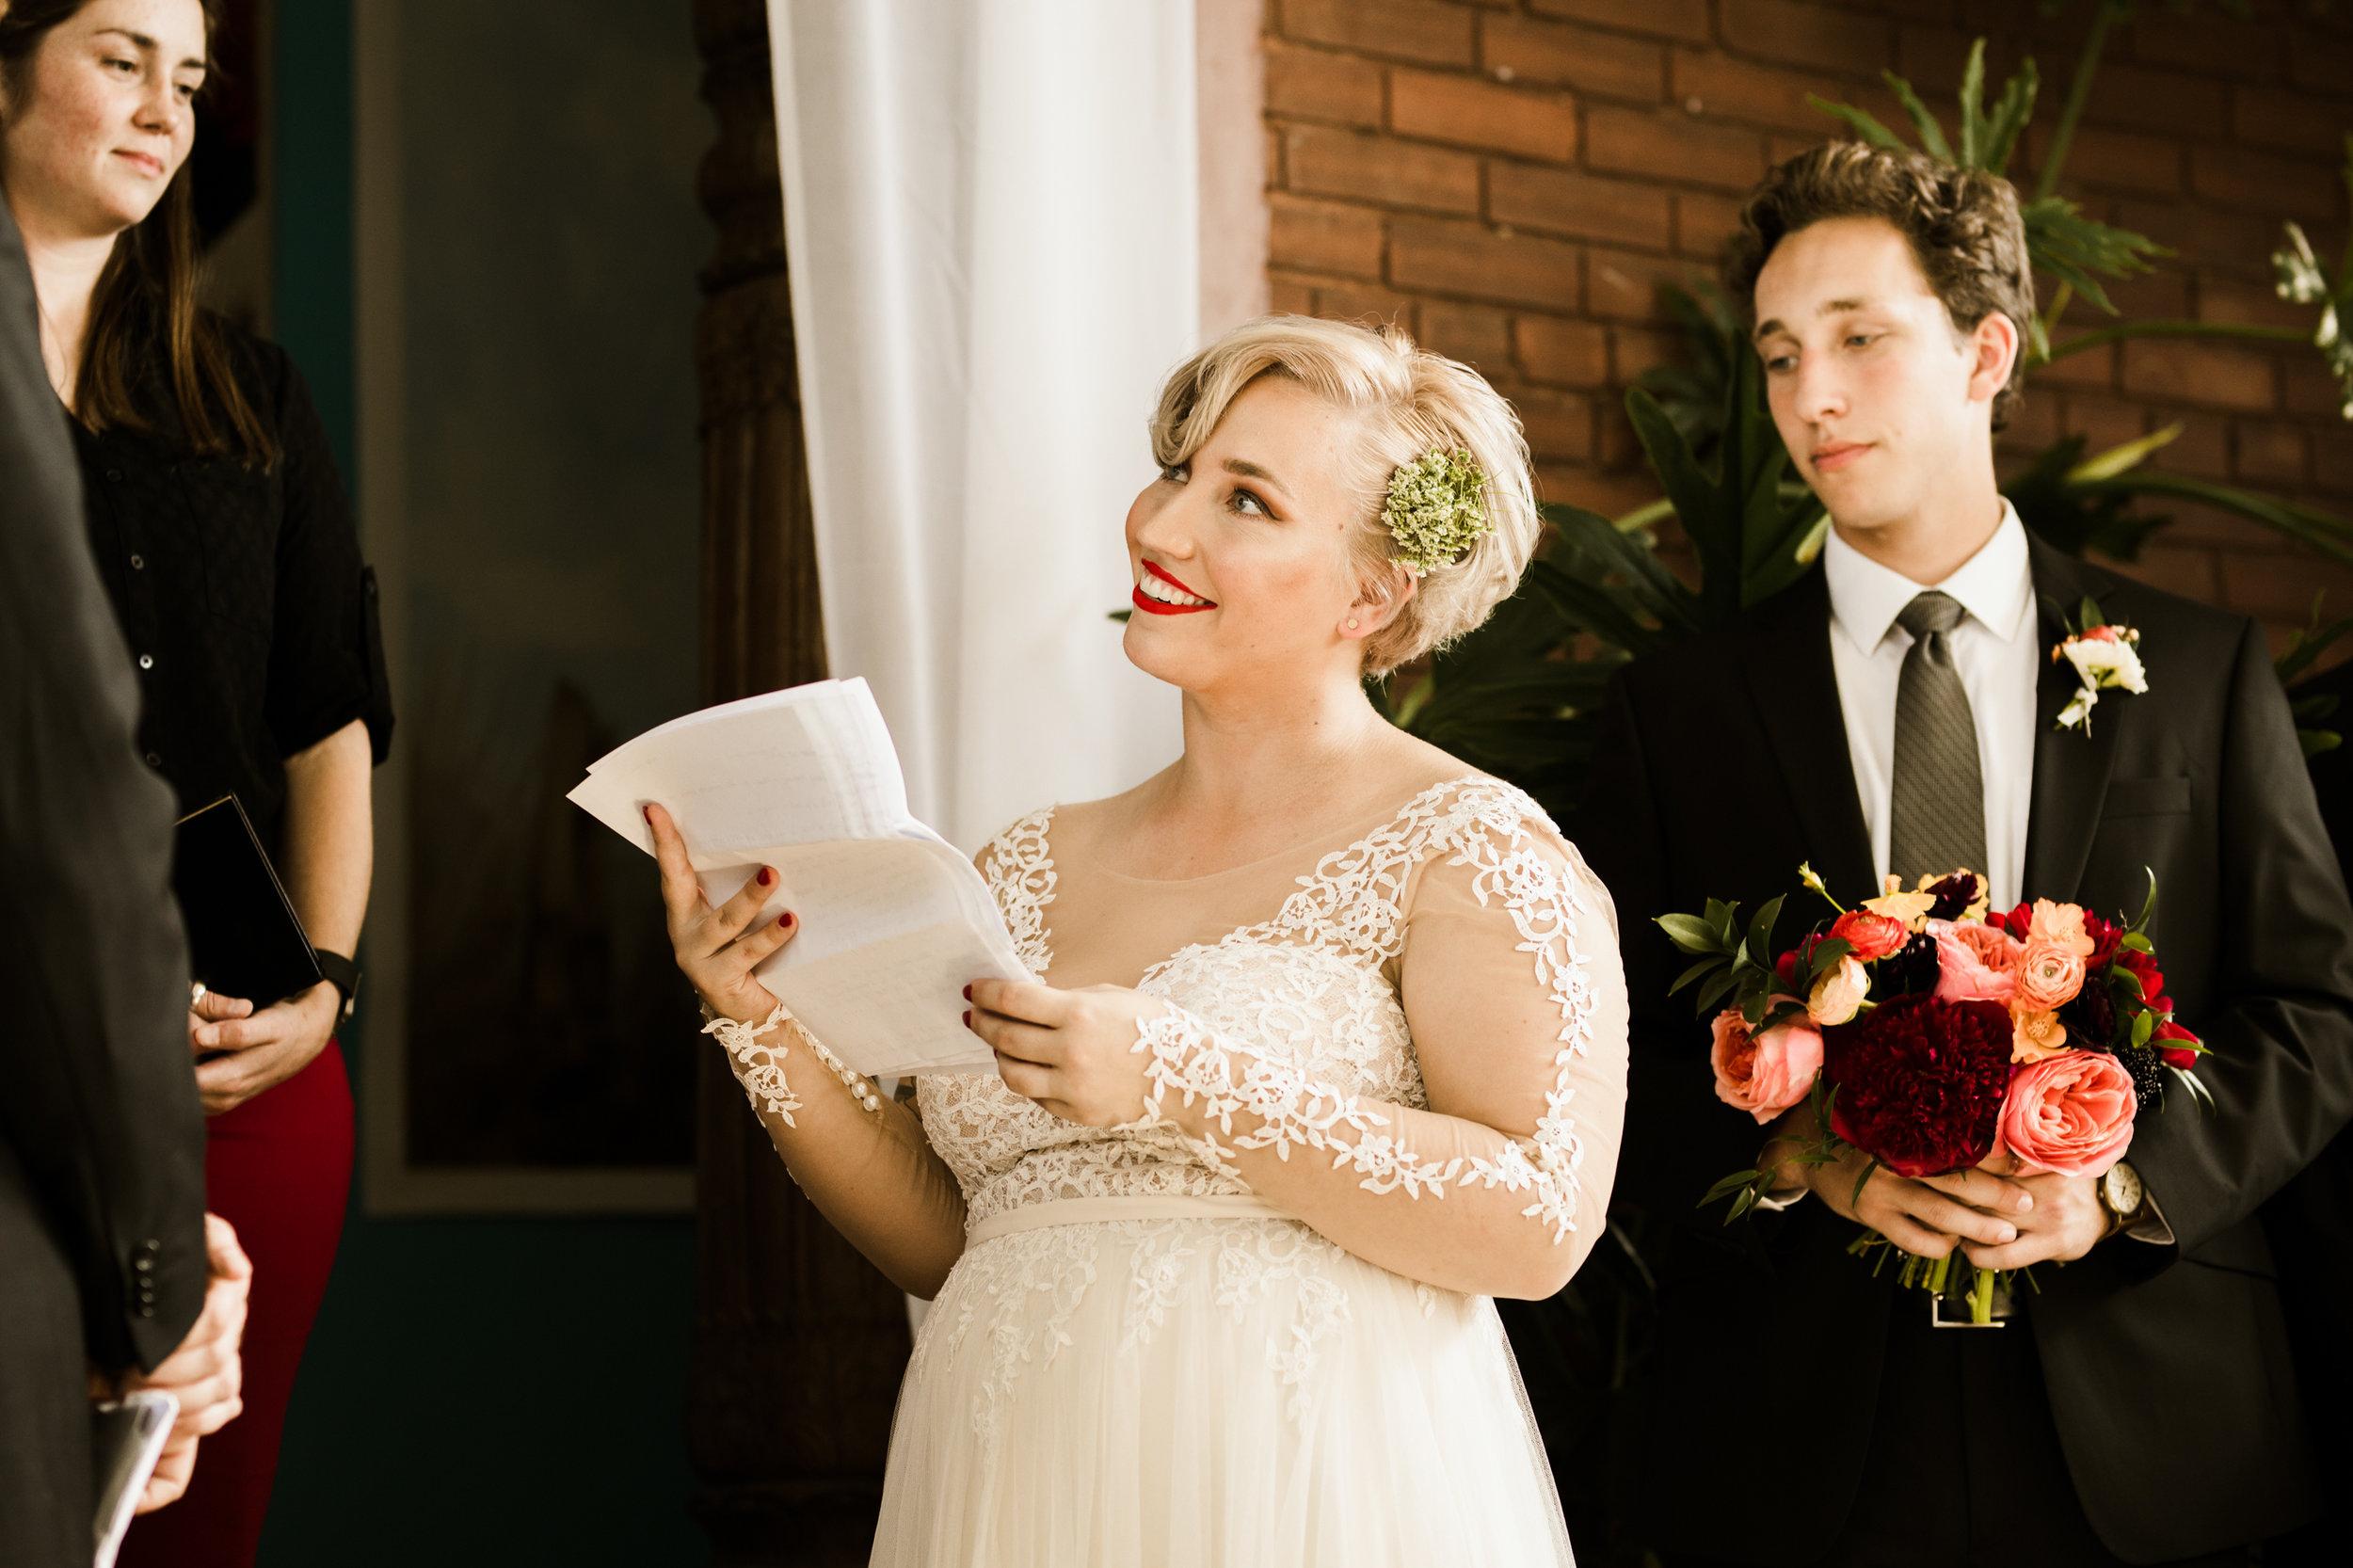 Kentucky Wedding Louisville Wedding Photographer 2018 Crystal Ludwick Photo Louisville Wedding Photographer Kentucky Wedding Photographer (44 of 105).jpg